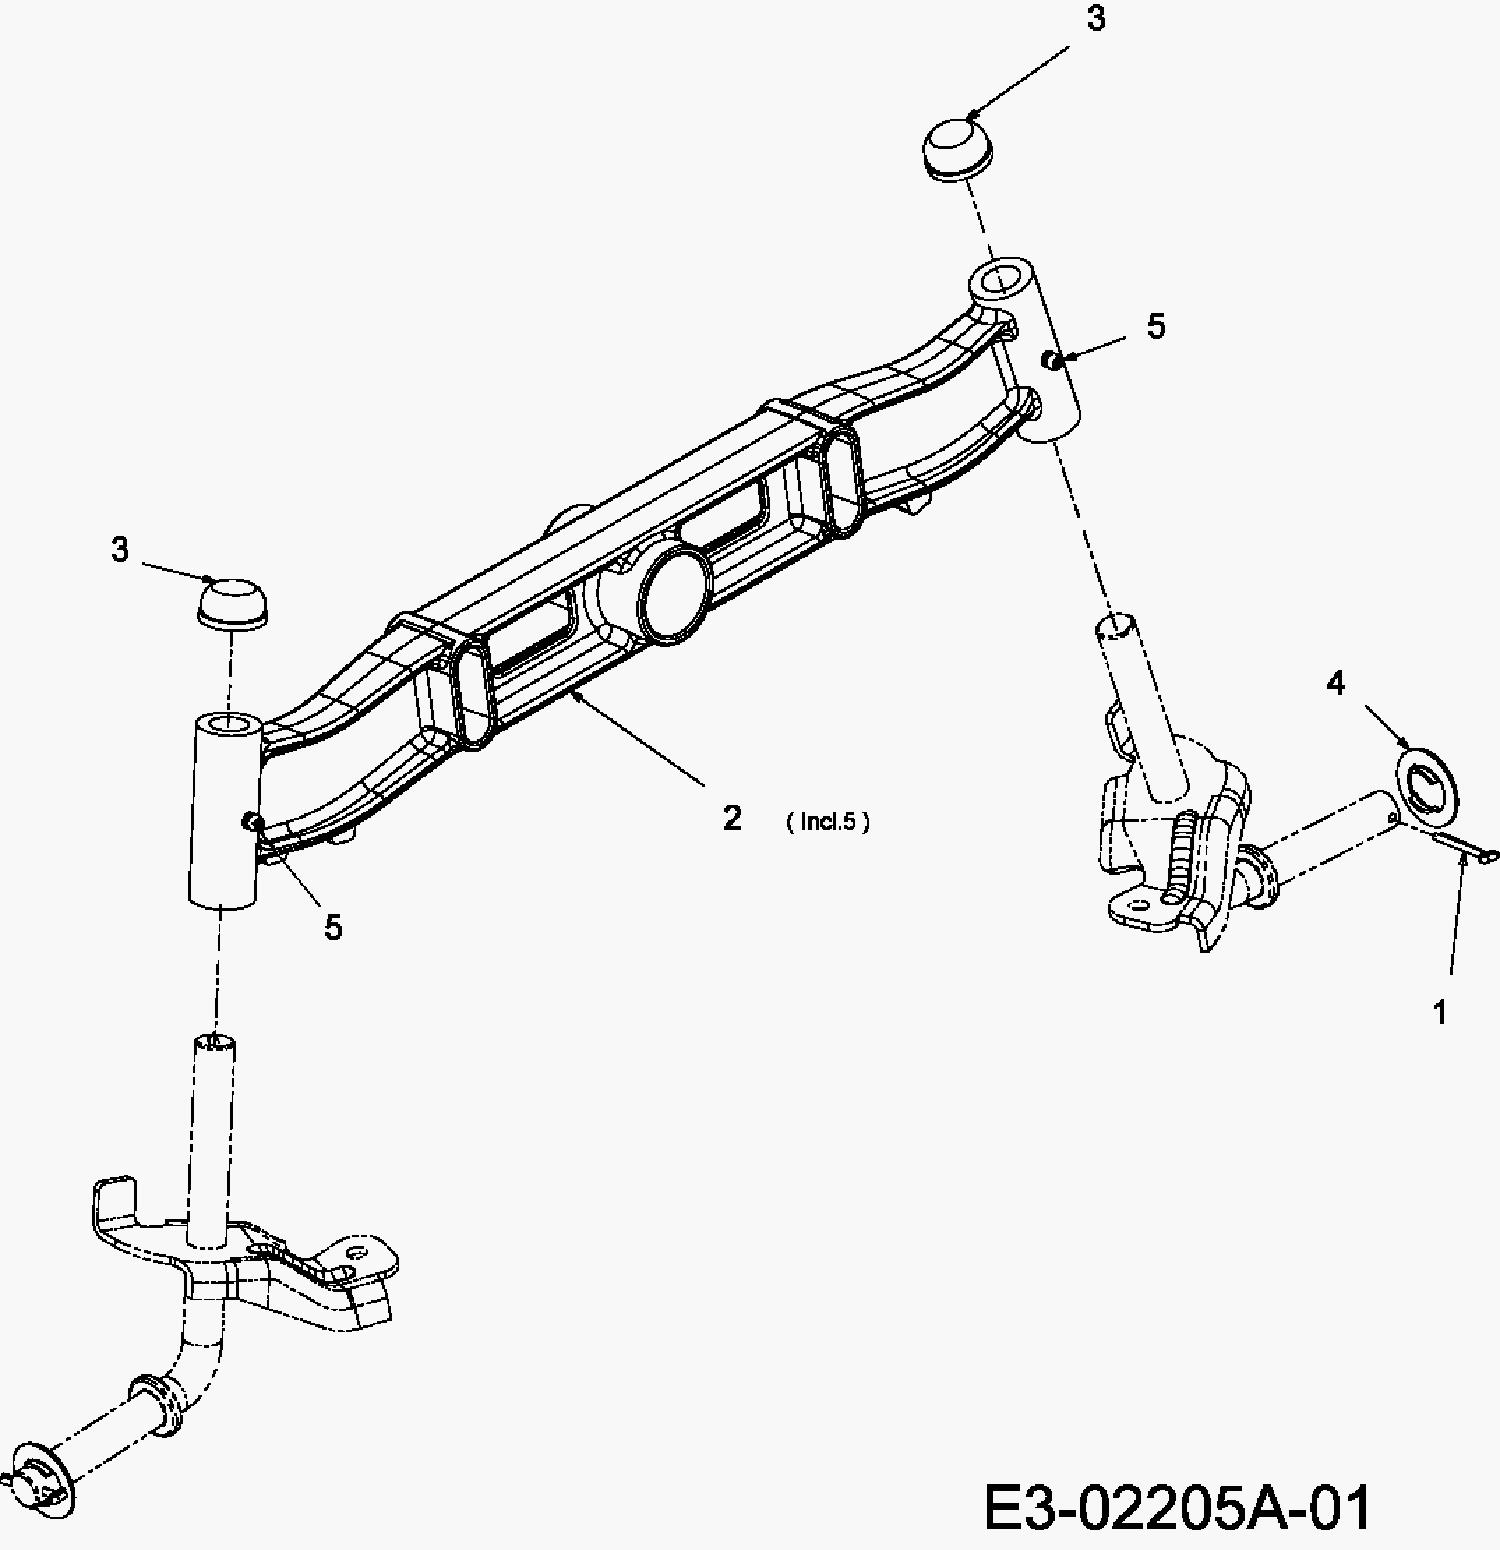 2002 nissan frontier motor diagram html